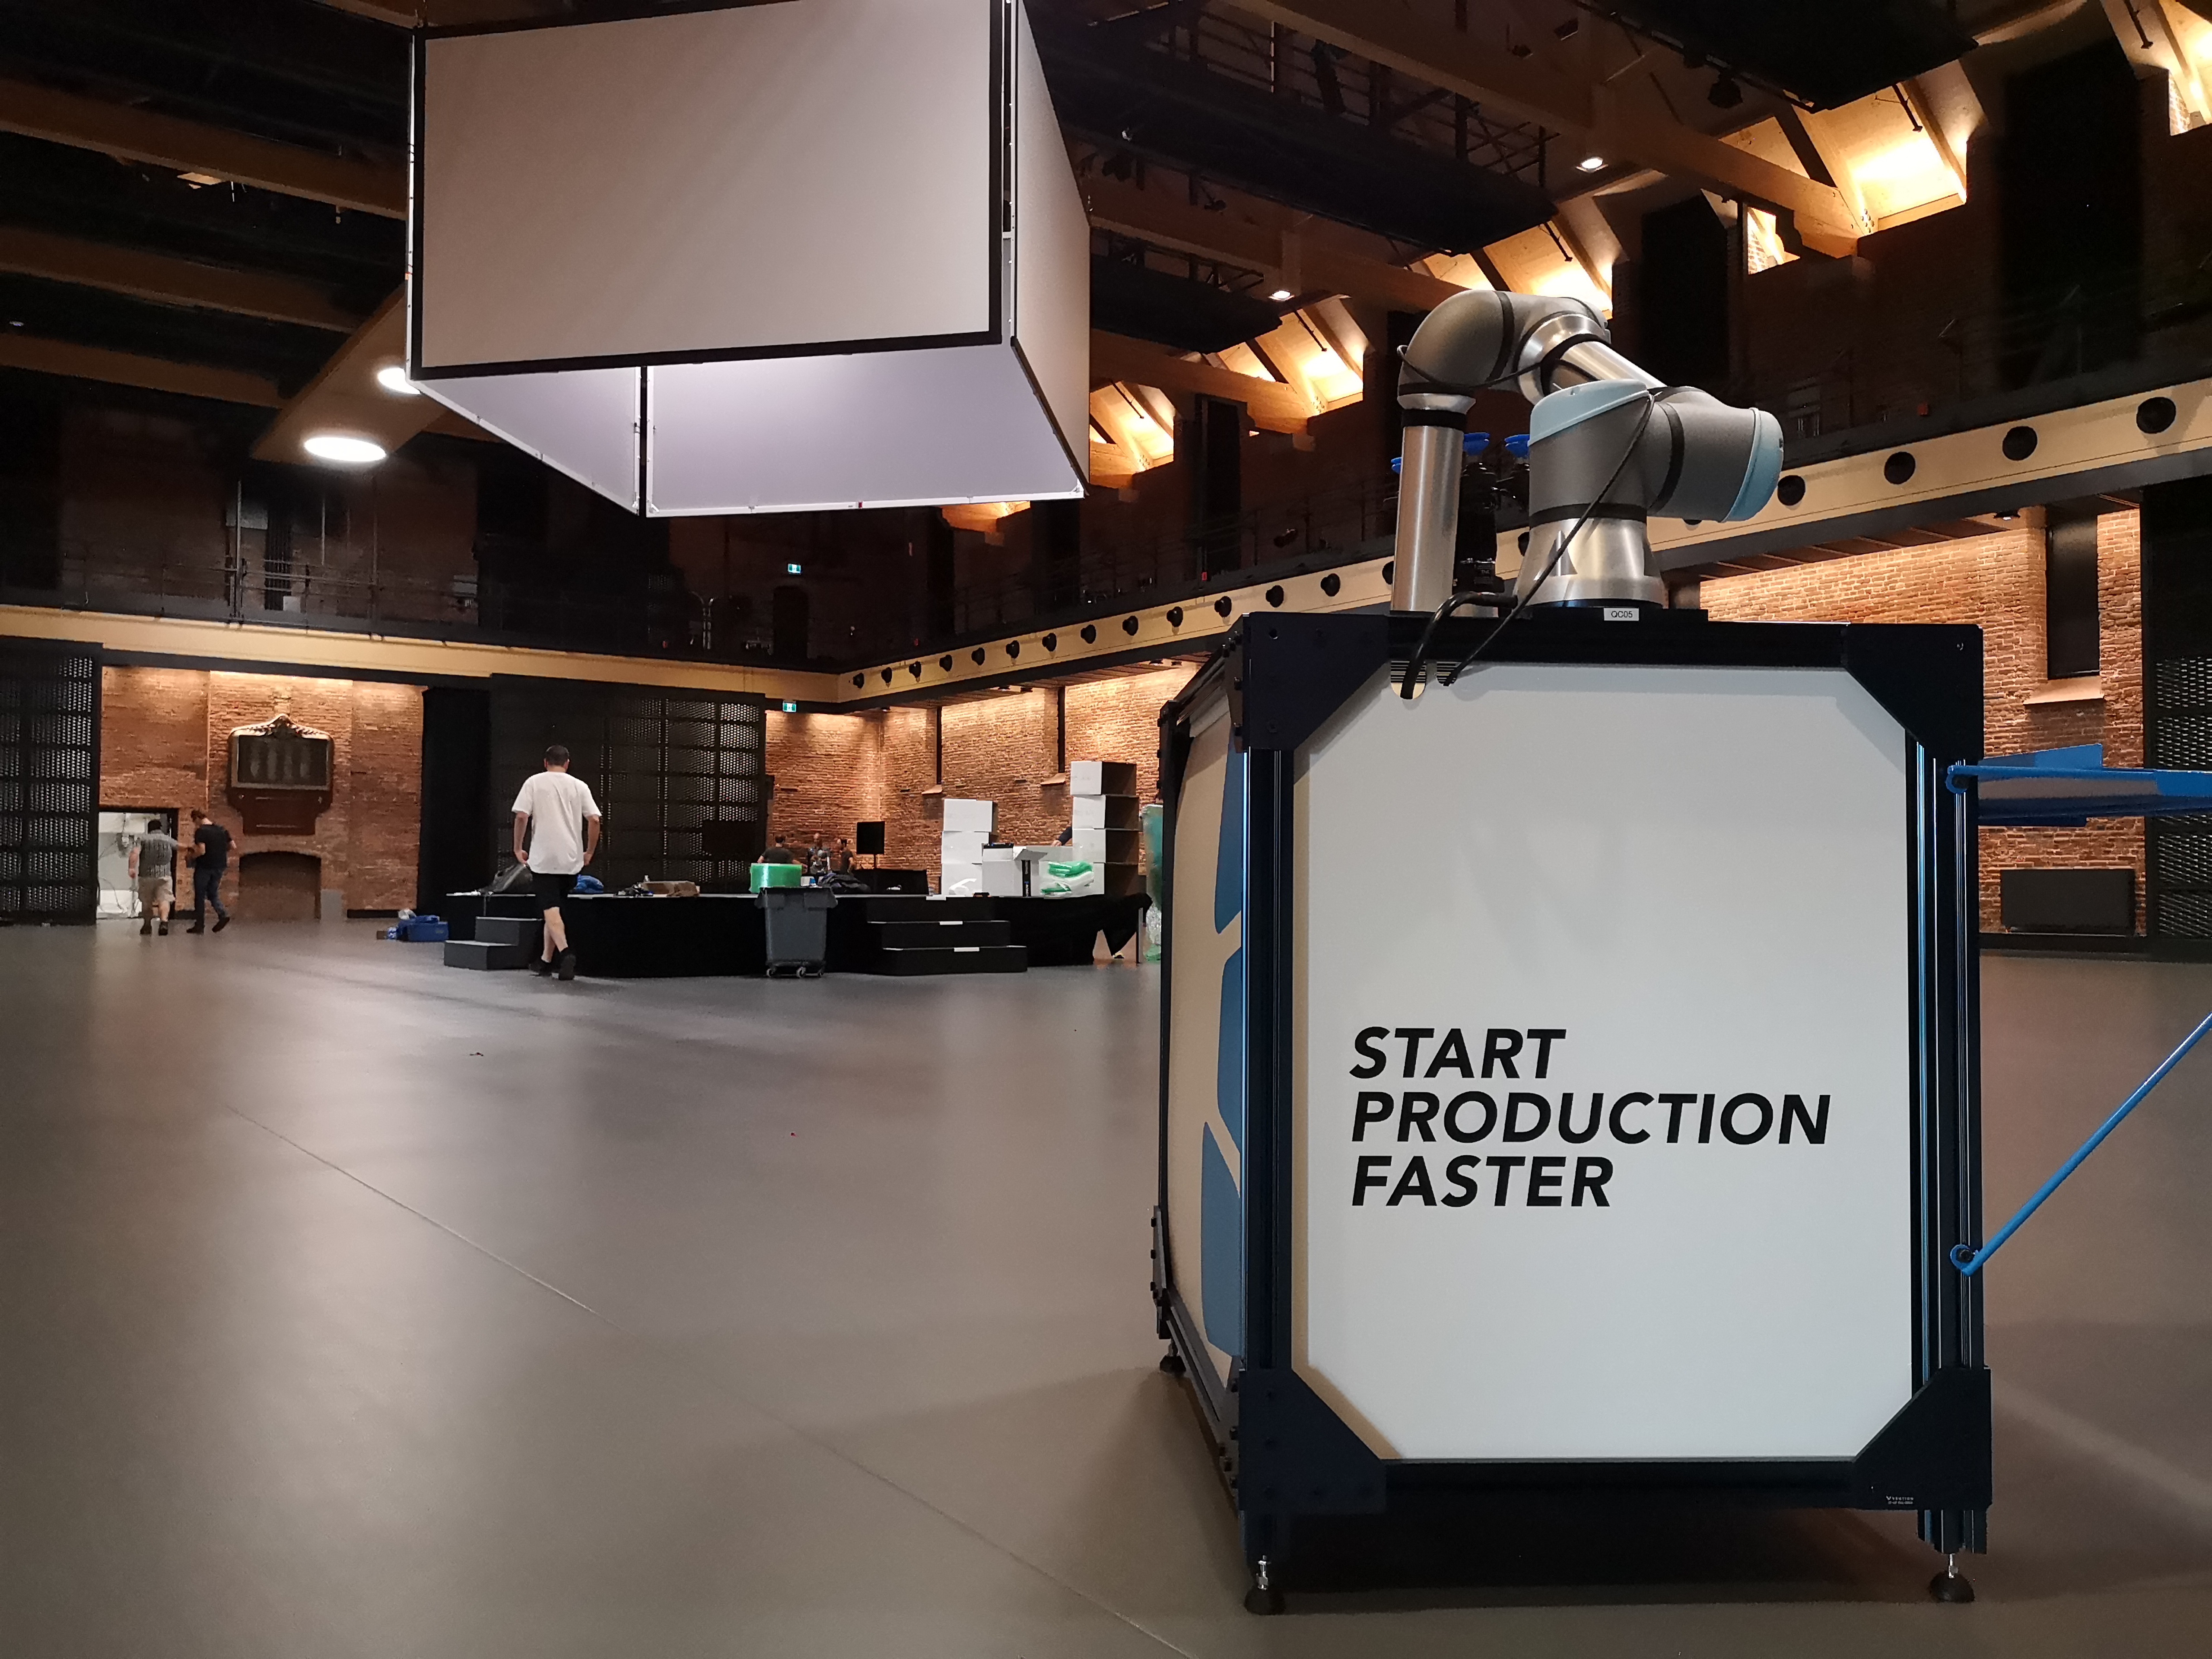 Workfloor: Robotics News for the Factory